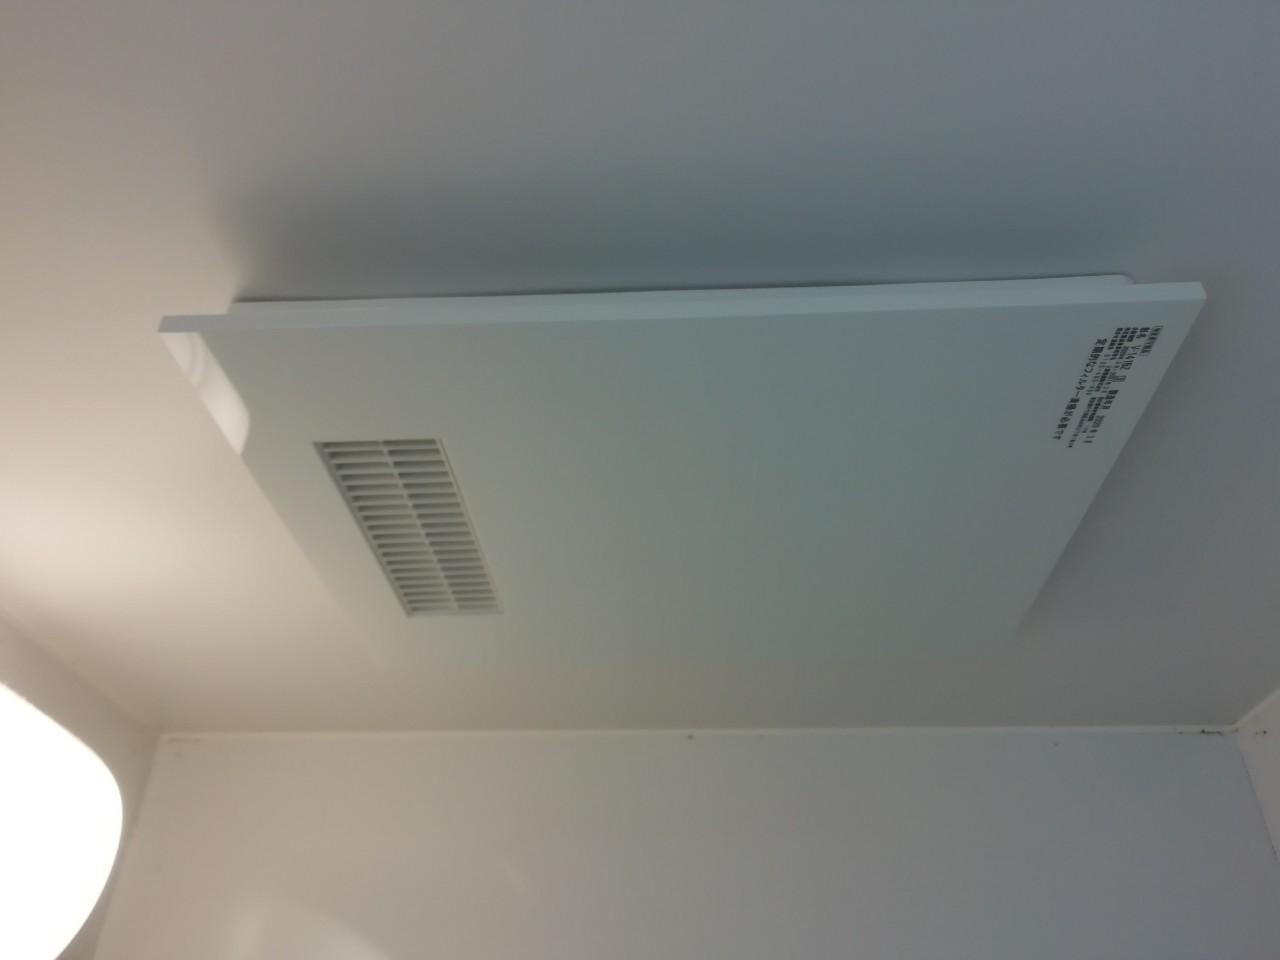 浴室暖房乾燥換気扇の交換工事|V-141BZ |京都市北区